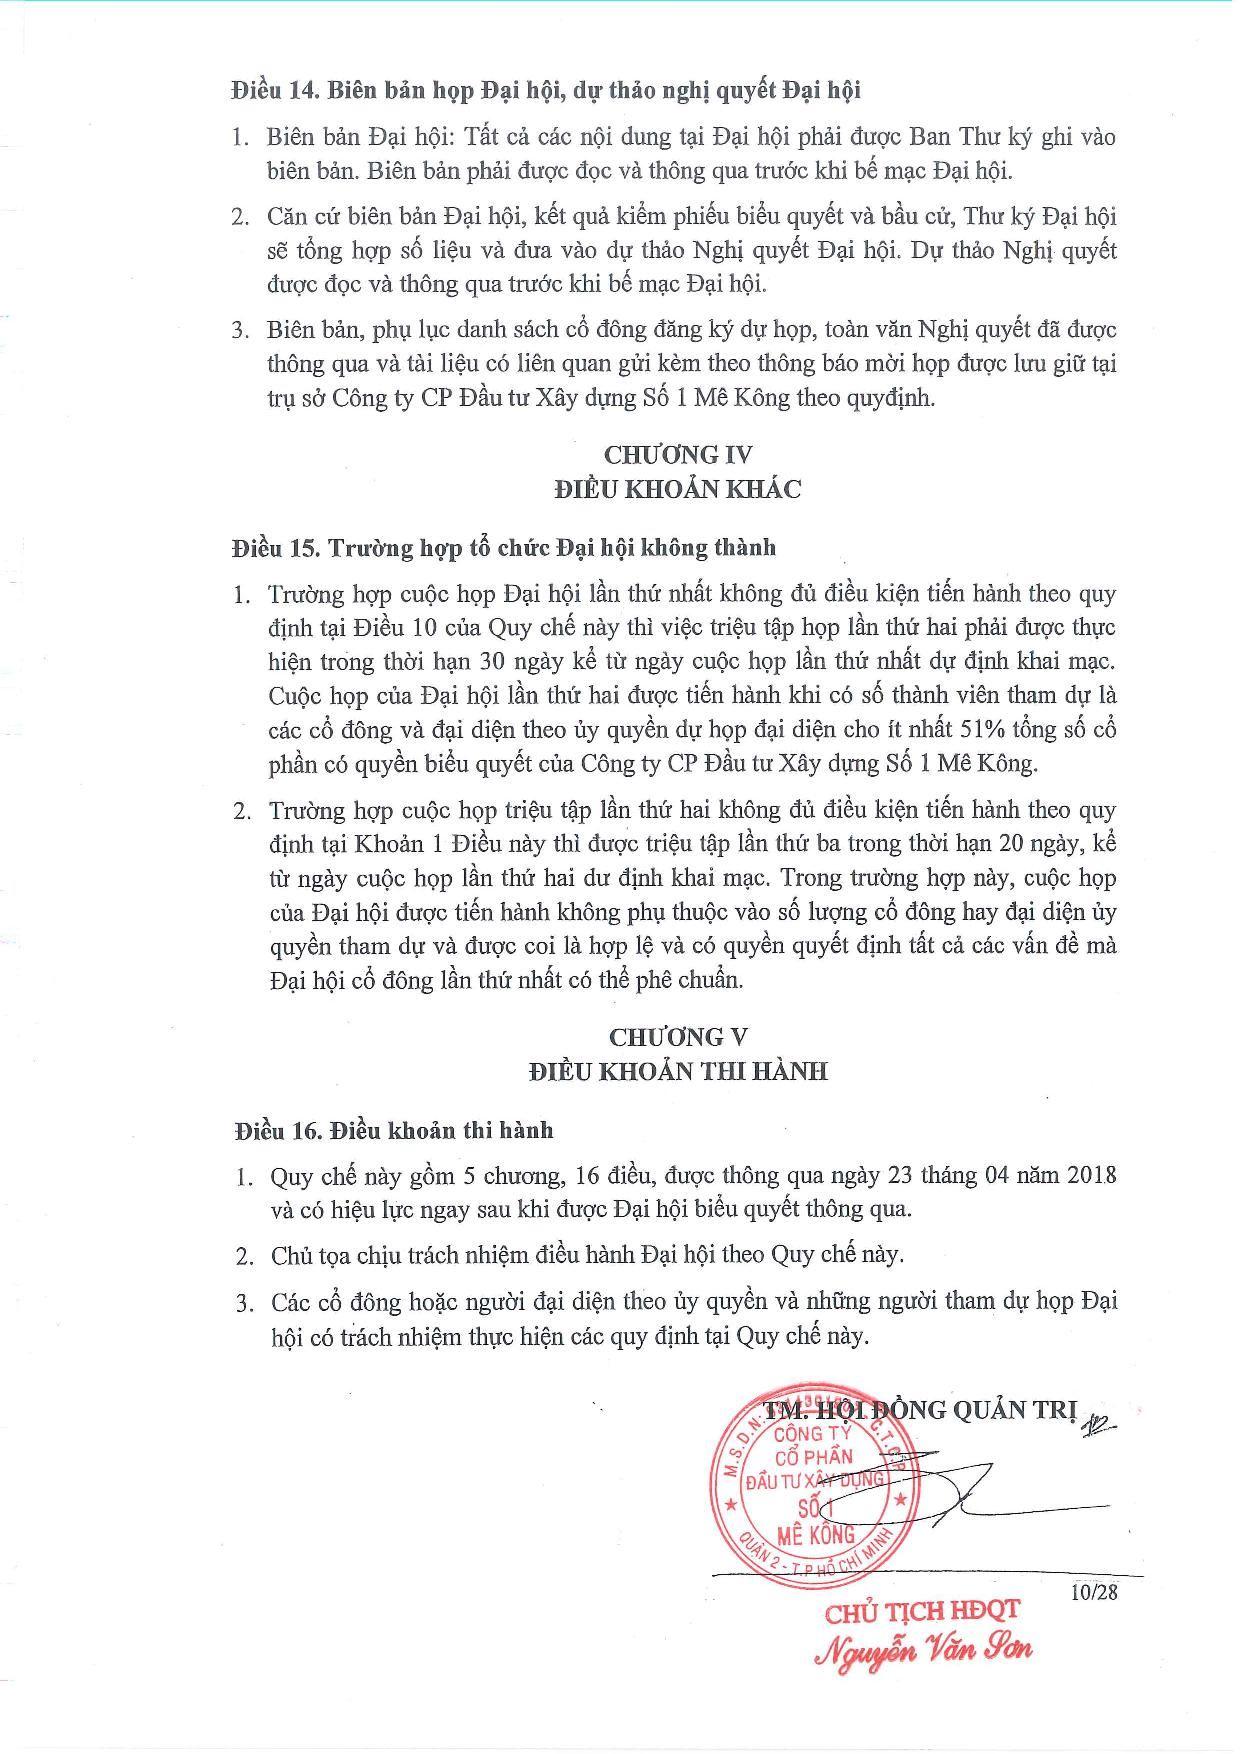 tai-lieu-dhcd-thuong-nien-2018-page (10)